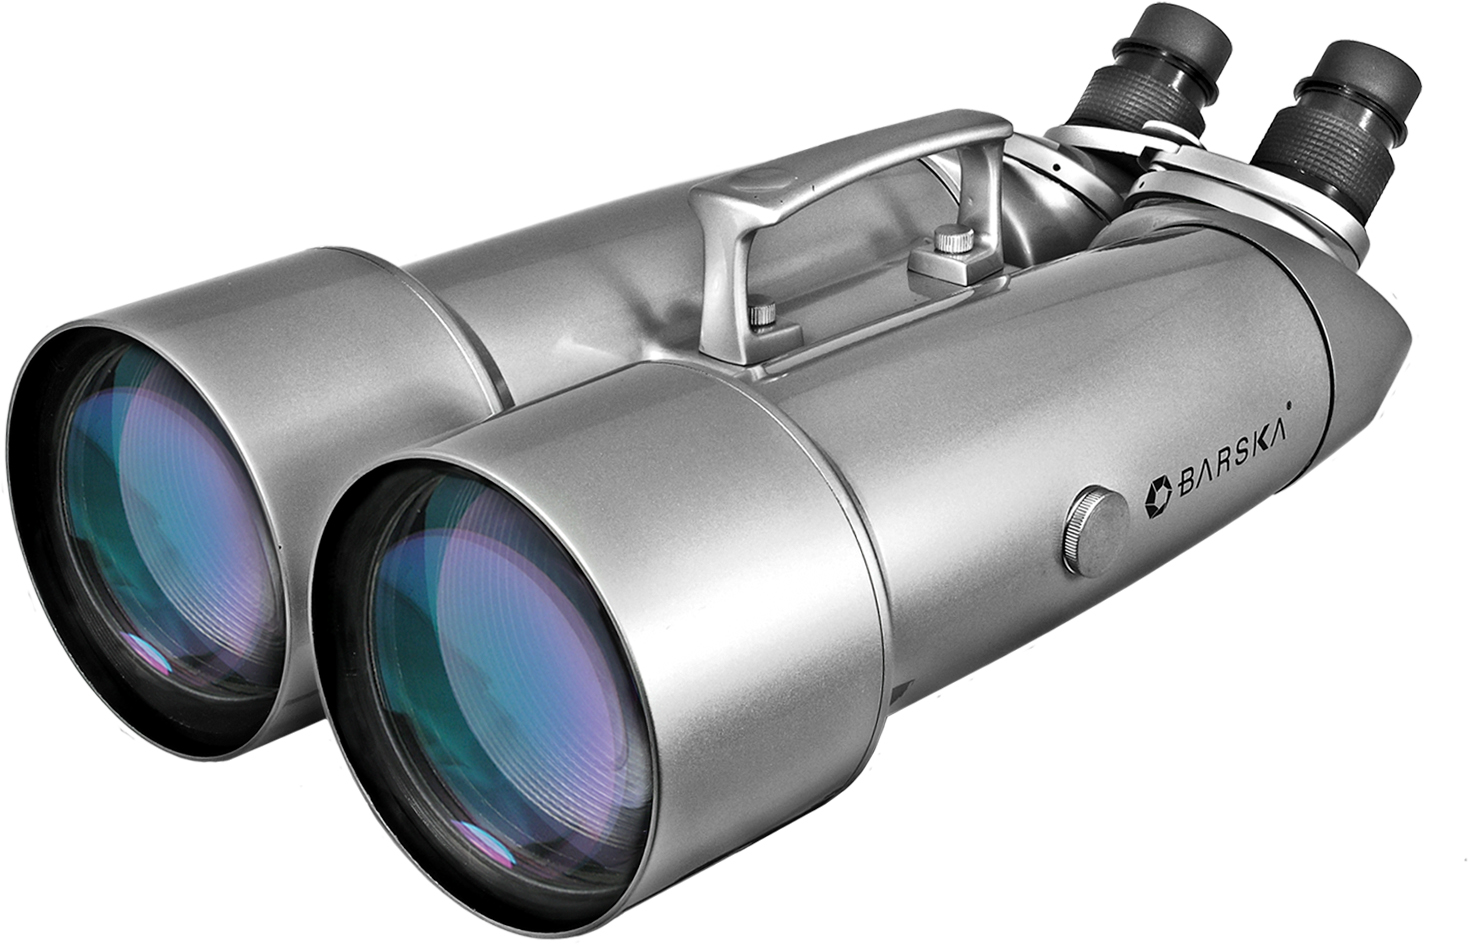 20x,40x100mm WP, Encounter, Jumbo Binoculars, Bak-4, MC, Green Lens, w  Premium HC by Barska